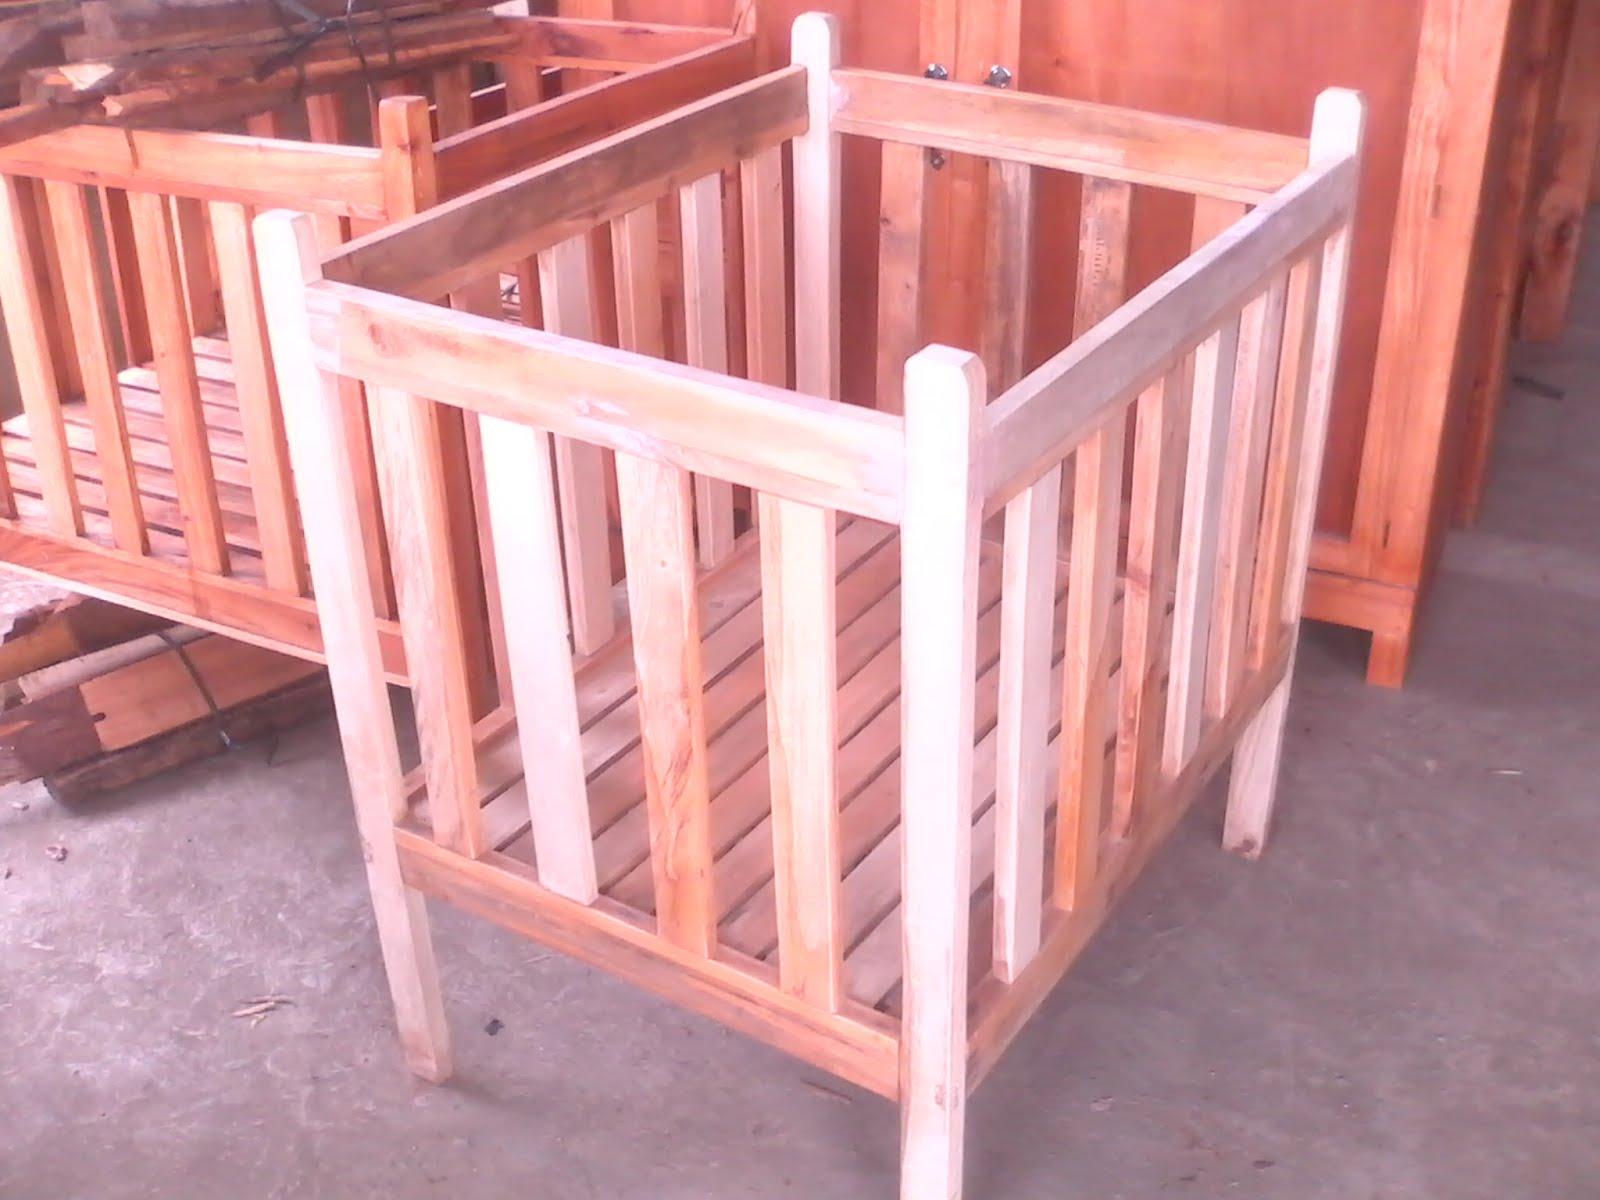 Furniture In Minglanilla Minglanilla Cebu